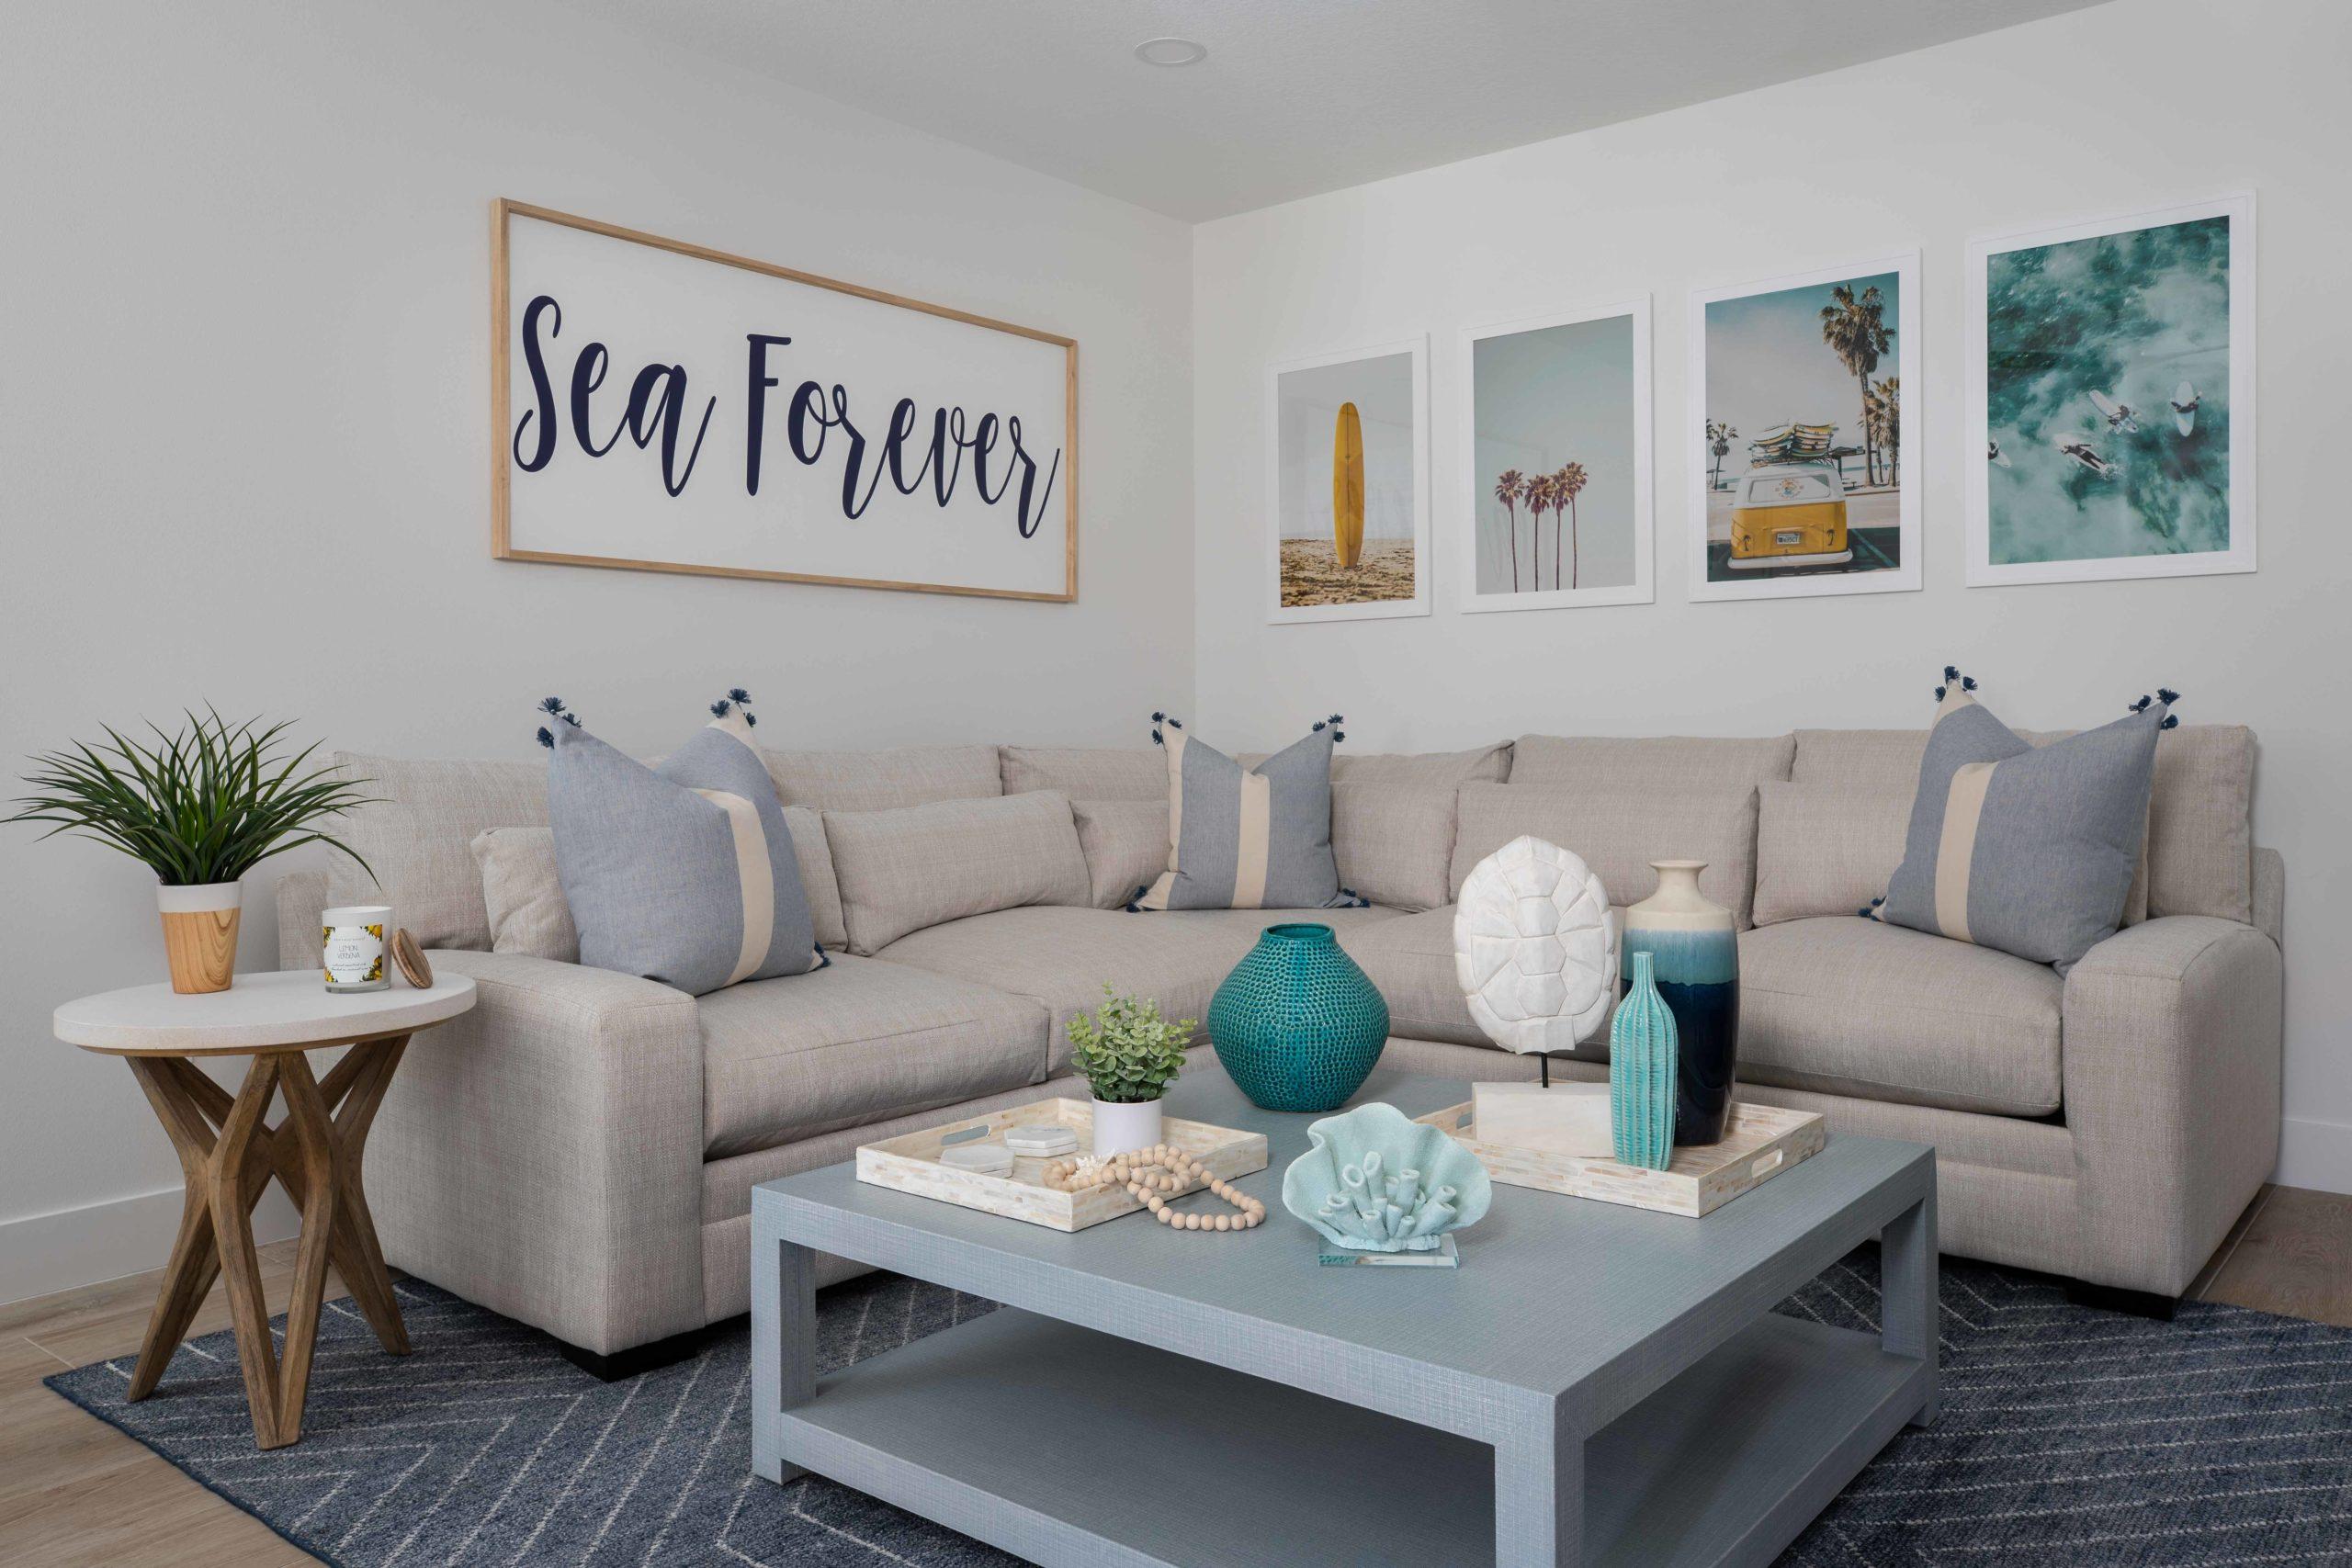 SEA FOREVER BEACH HOUSE LIVING